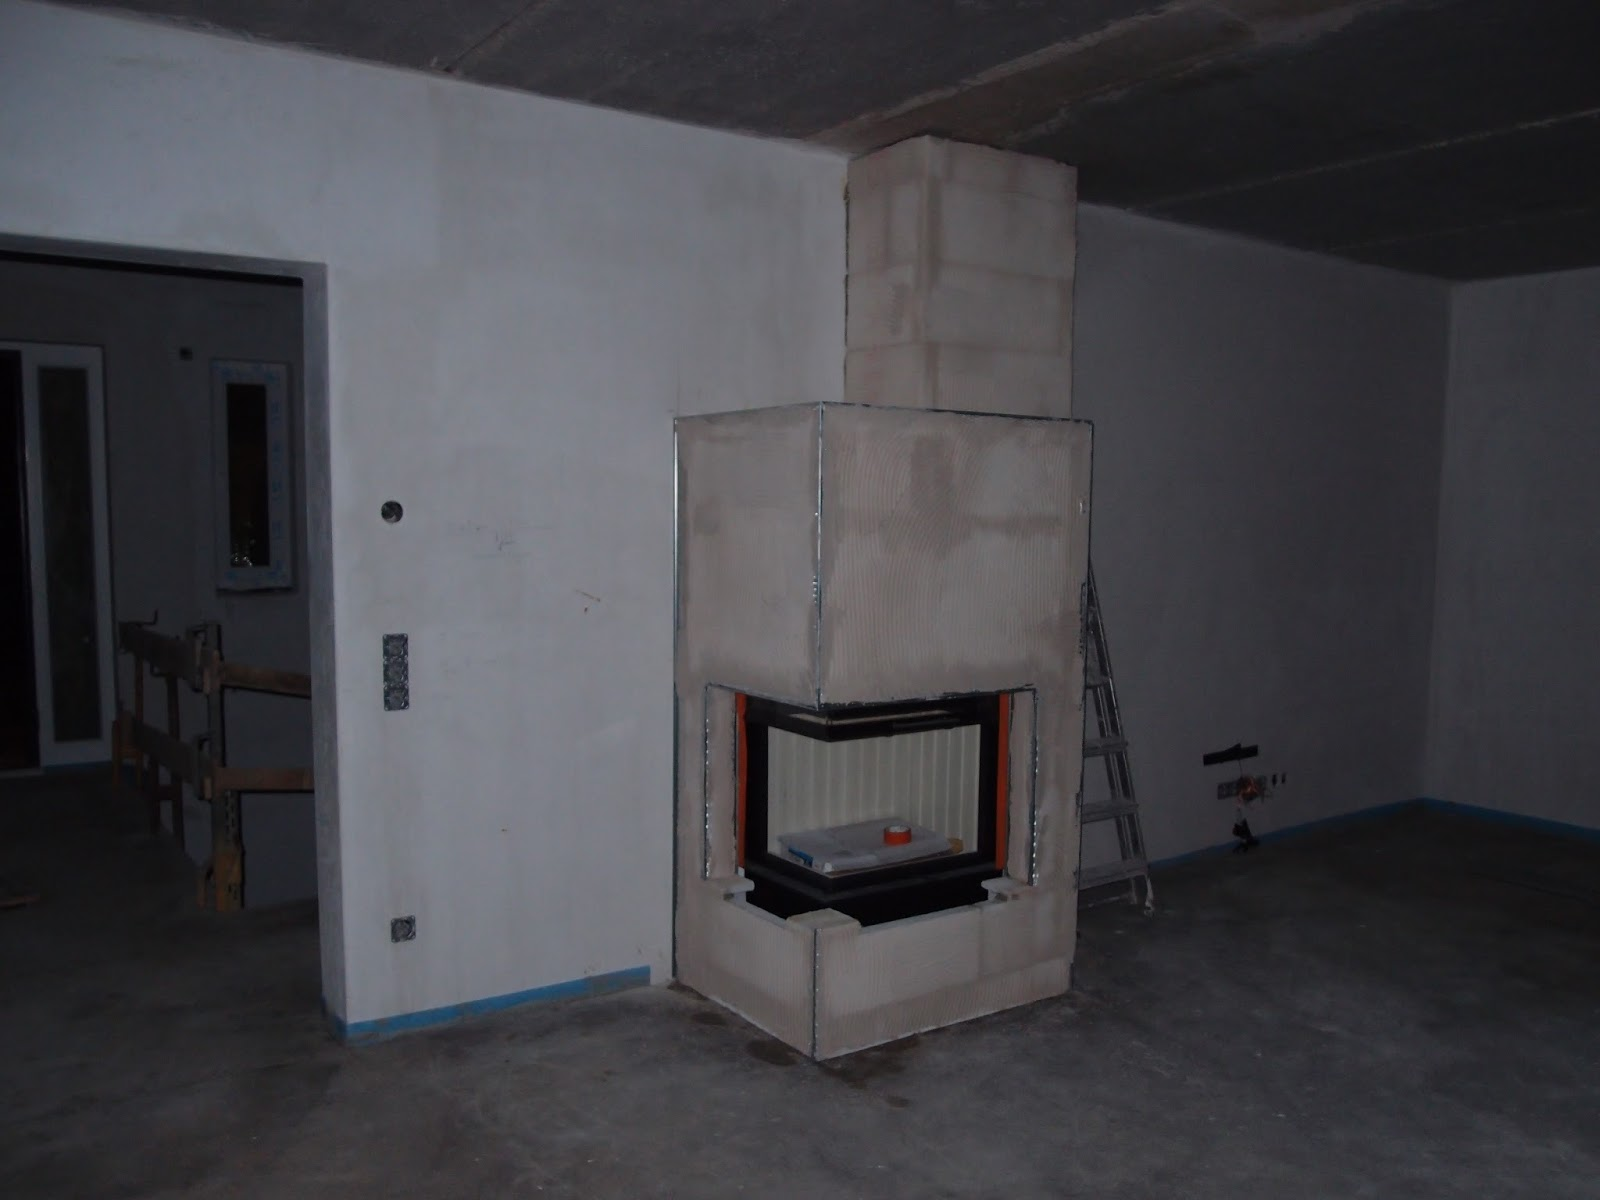 fliesen hinter kamin beste bildideen zu hause design. Black Bedroom Furniture Sets. Home Design Ideas